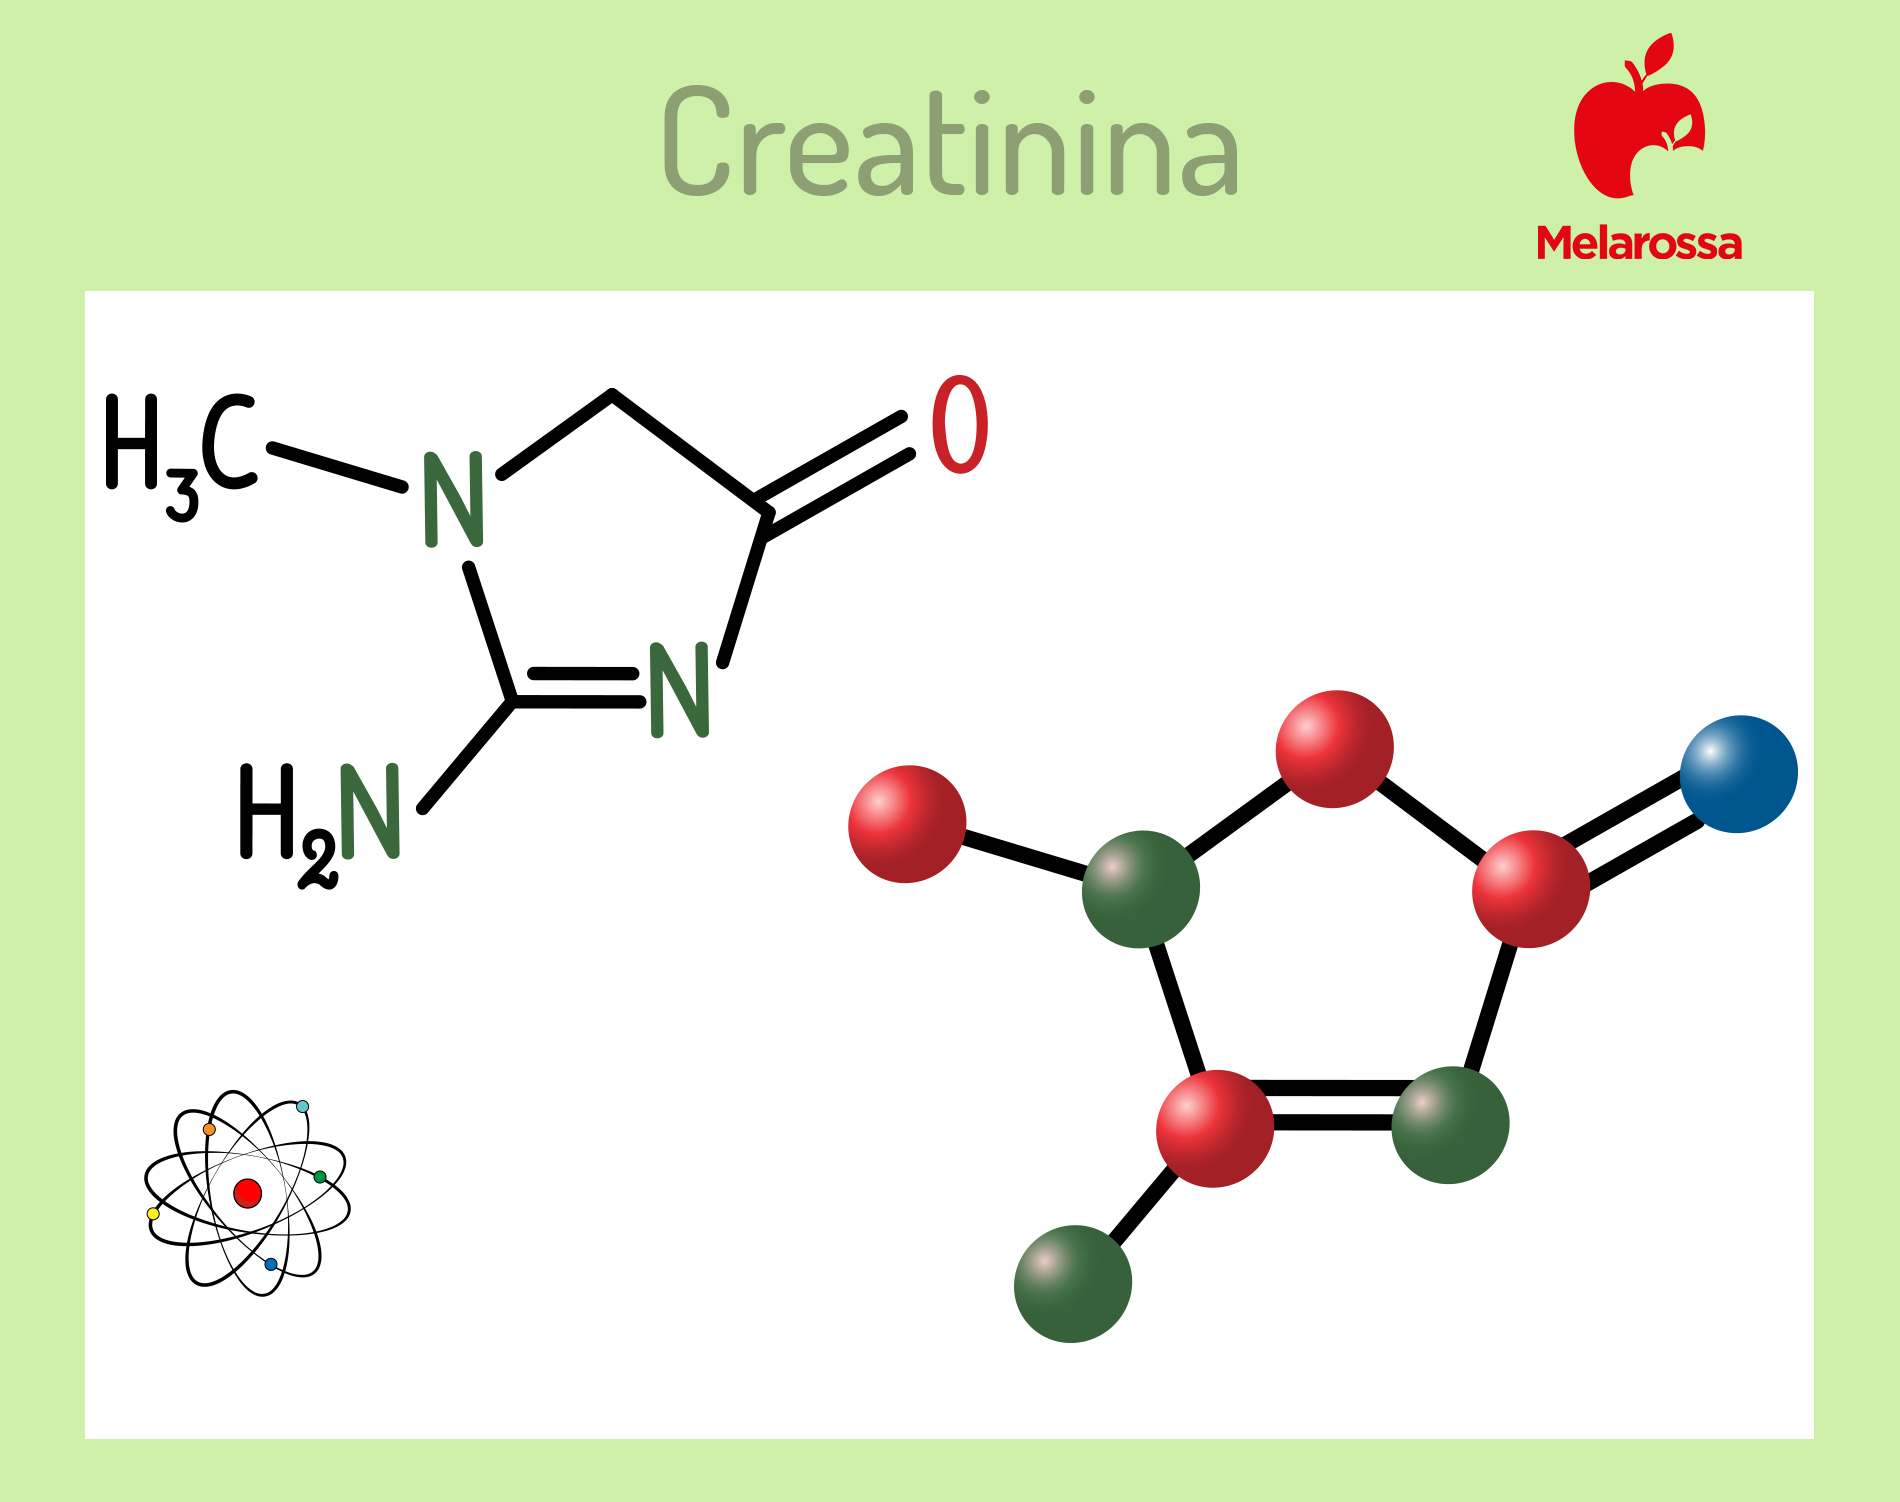 creatinina: cos'è